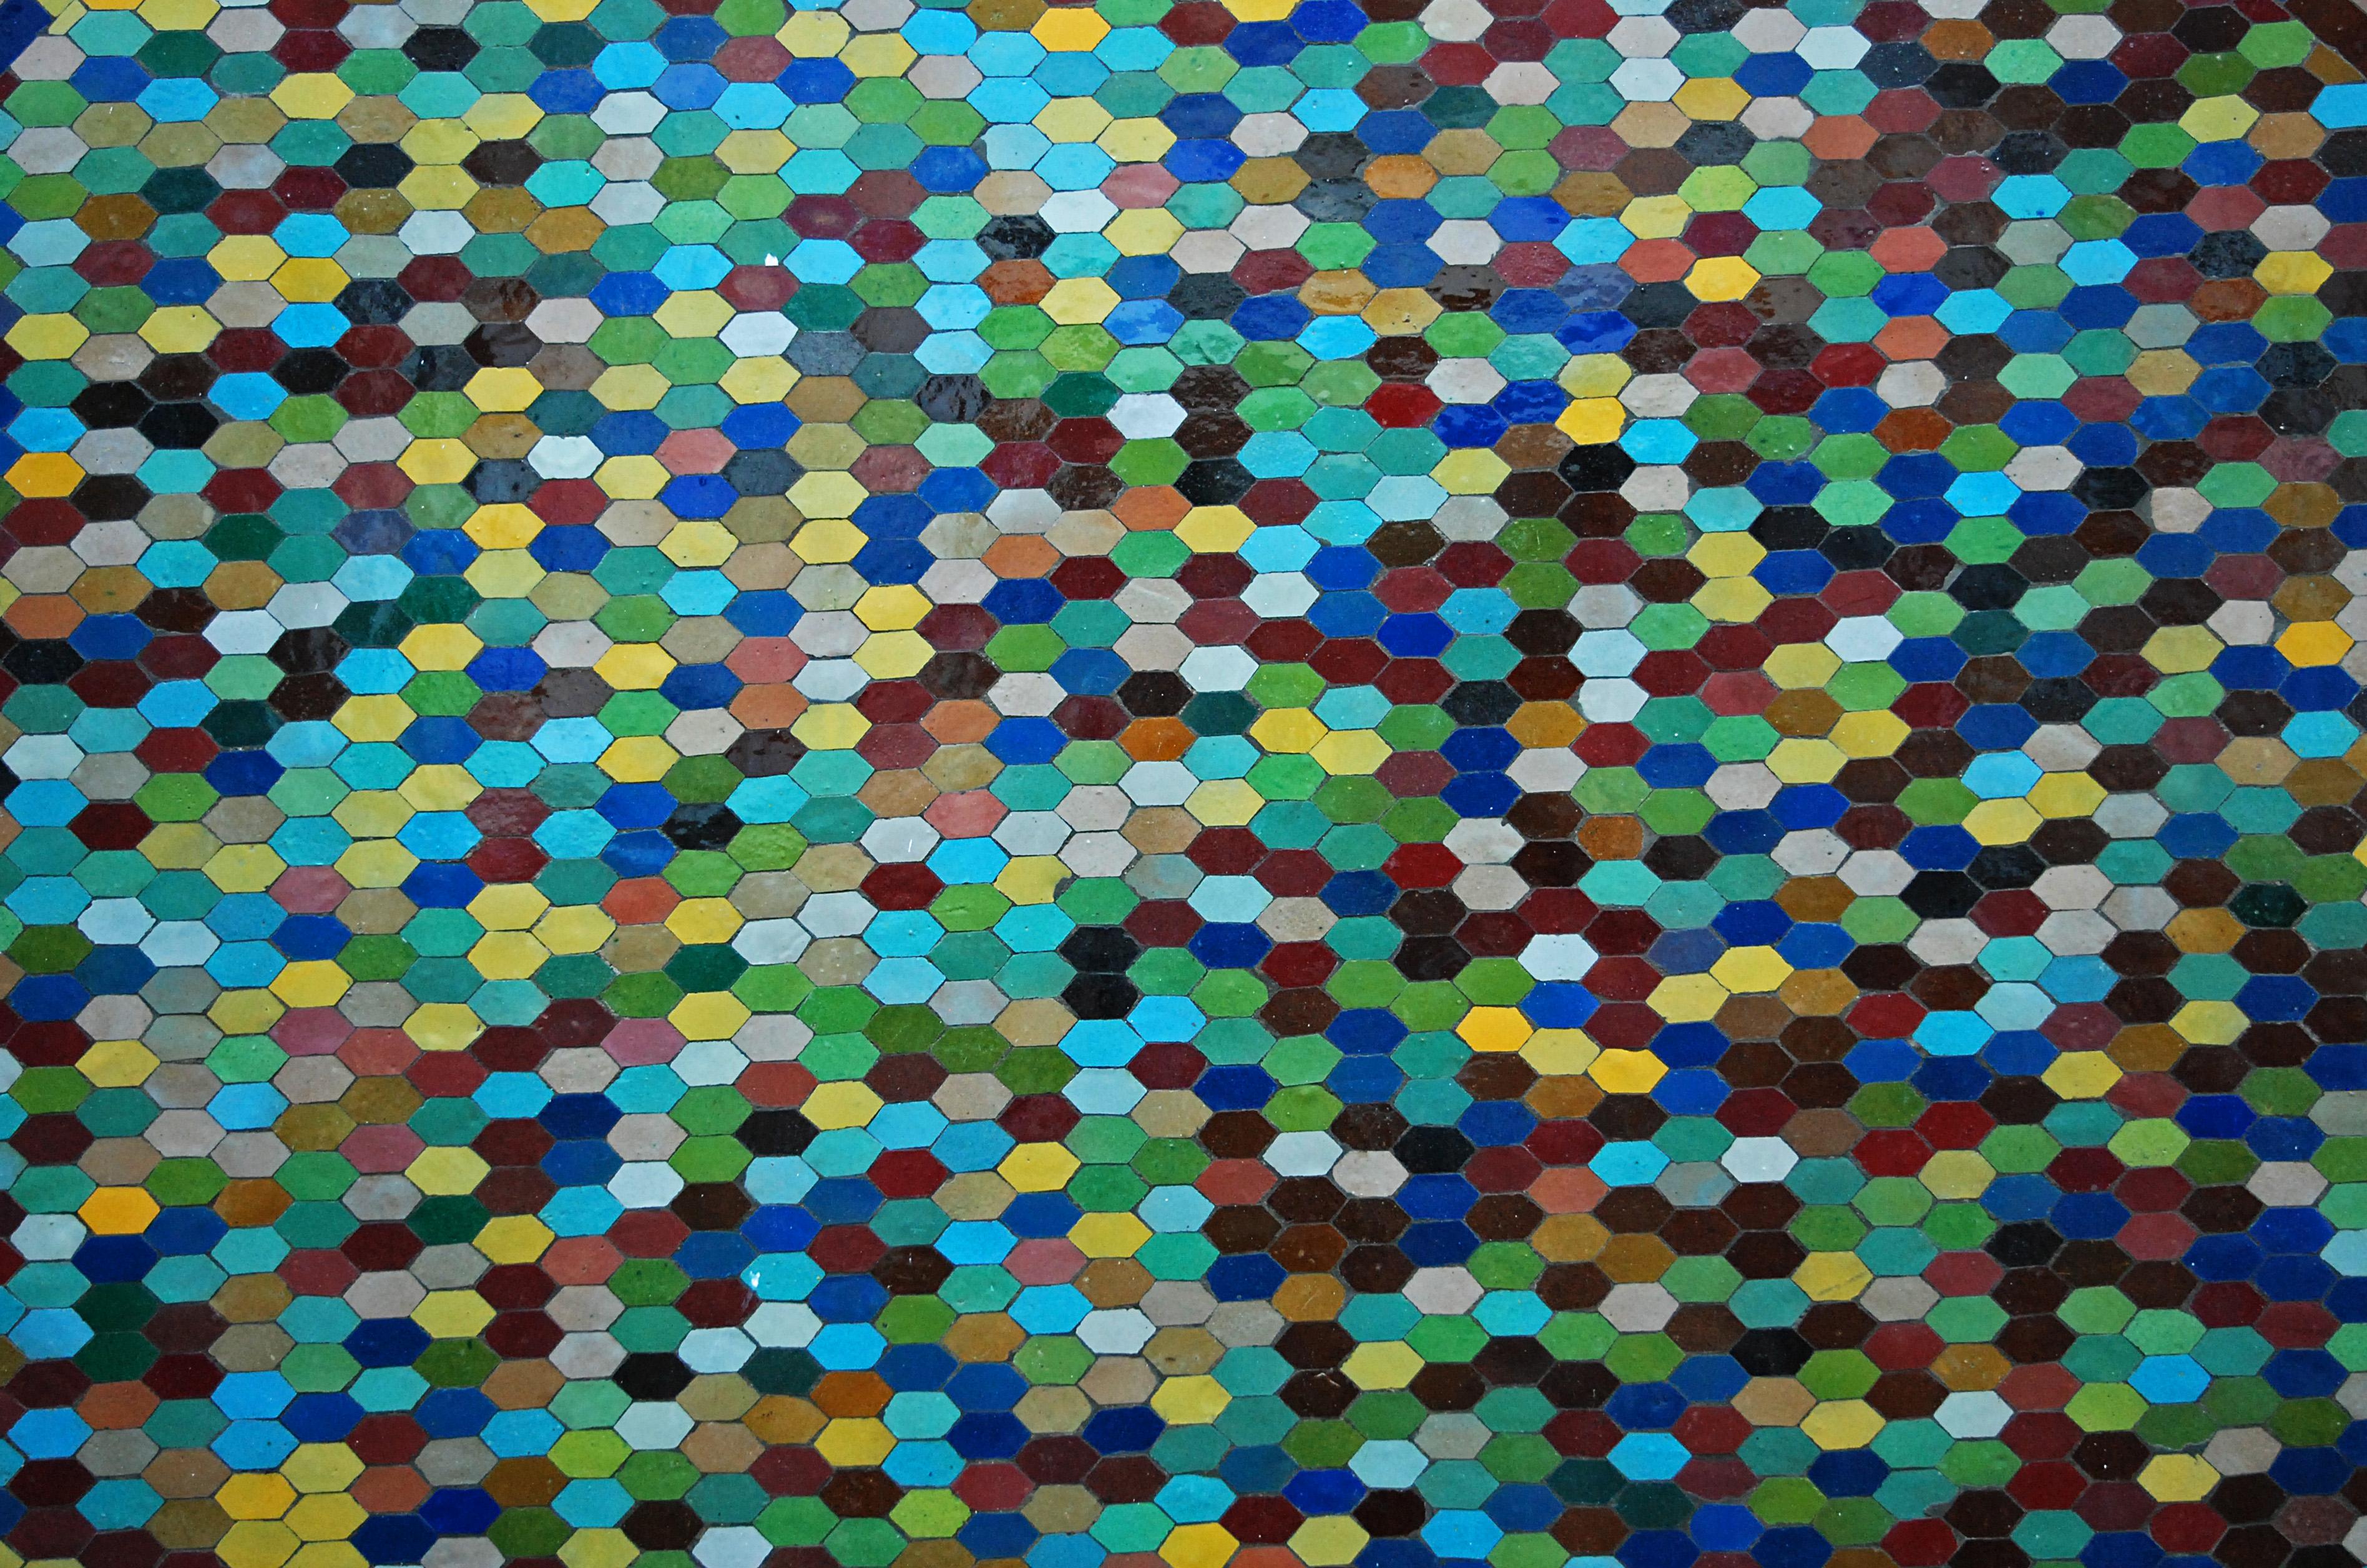 Fez Tiles Flickr Photo Sharing